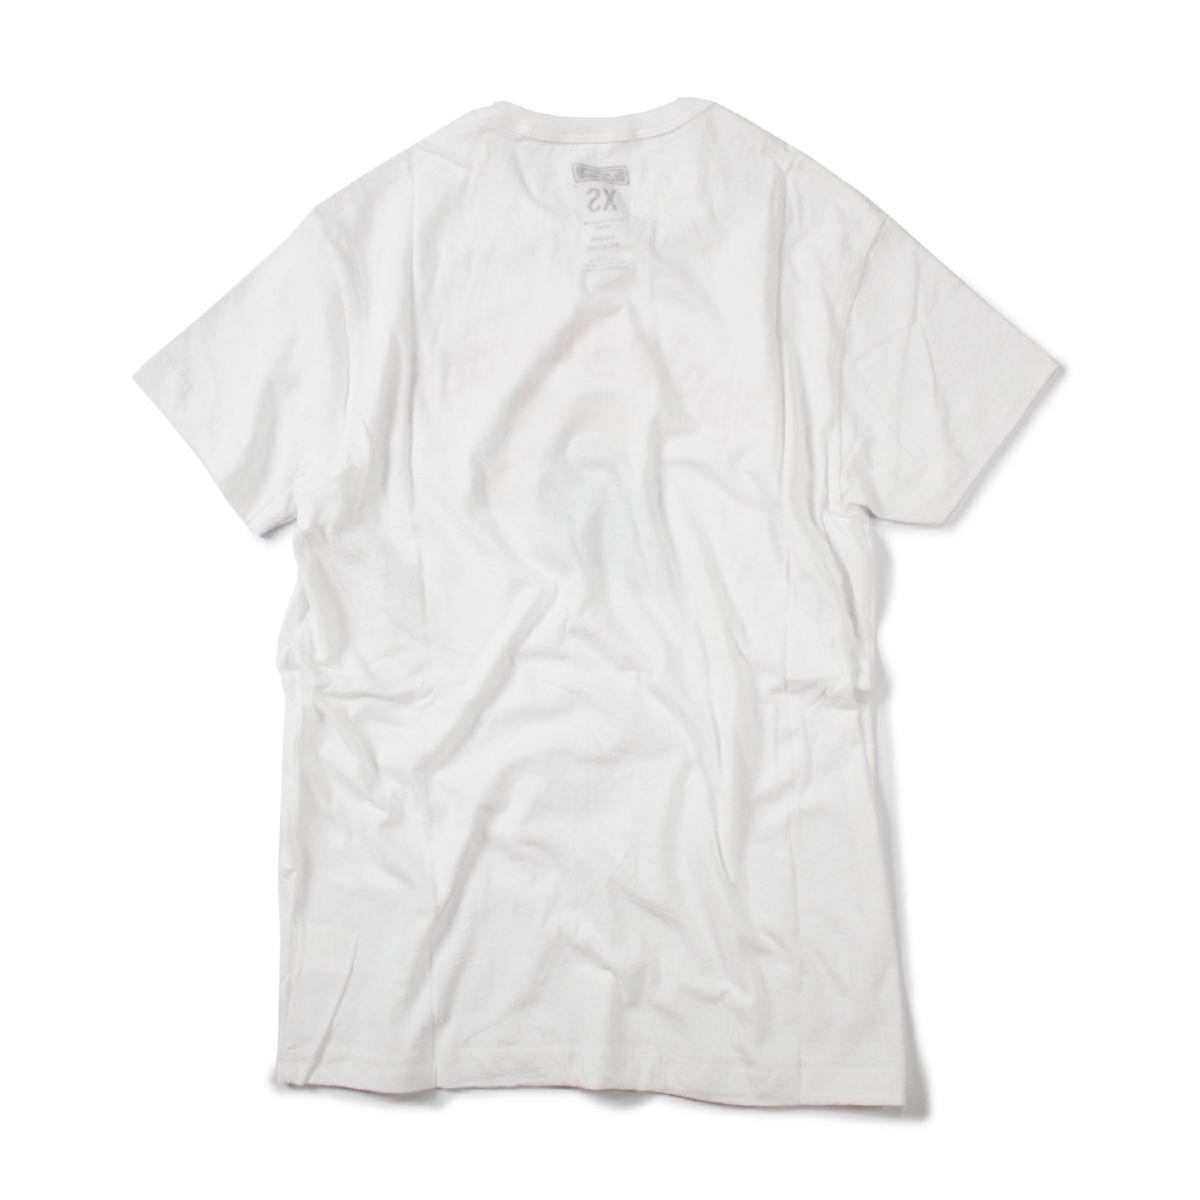 TAILGATE テイルゲート HOLY JALEPENO Tシャツ